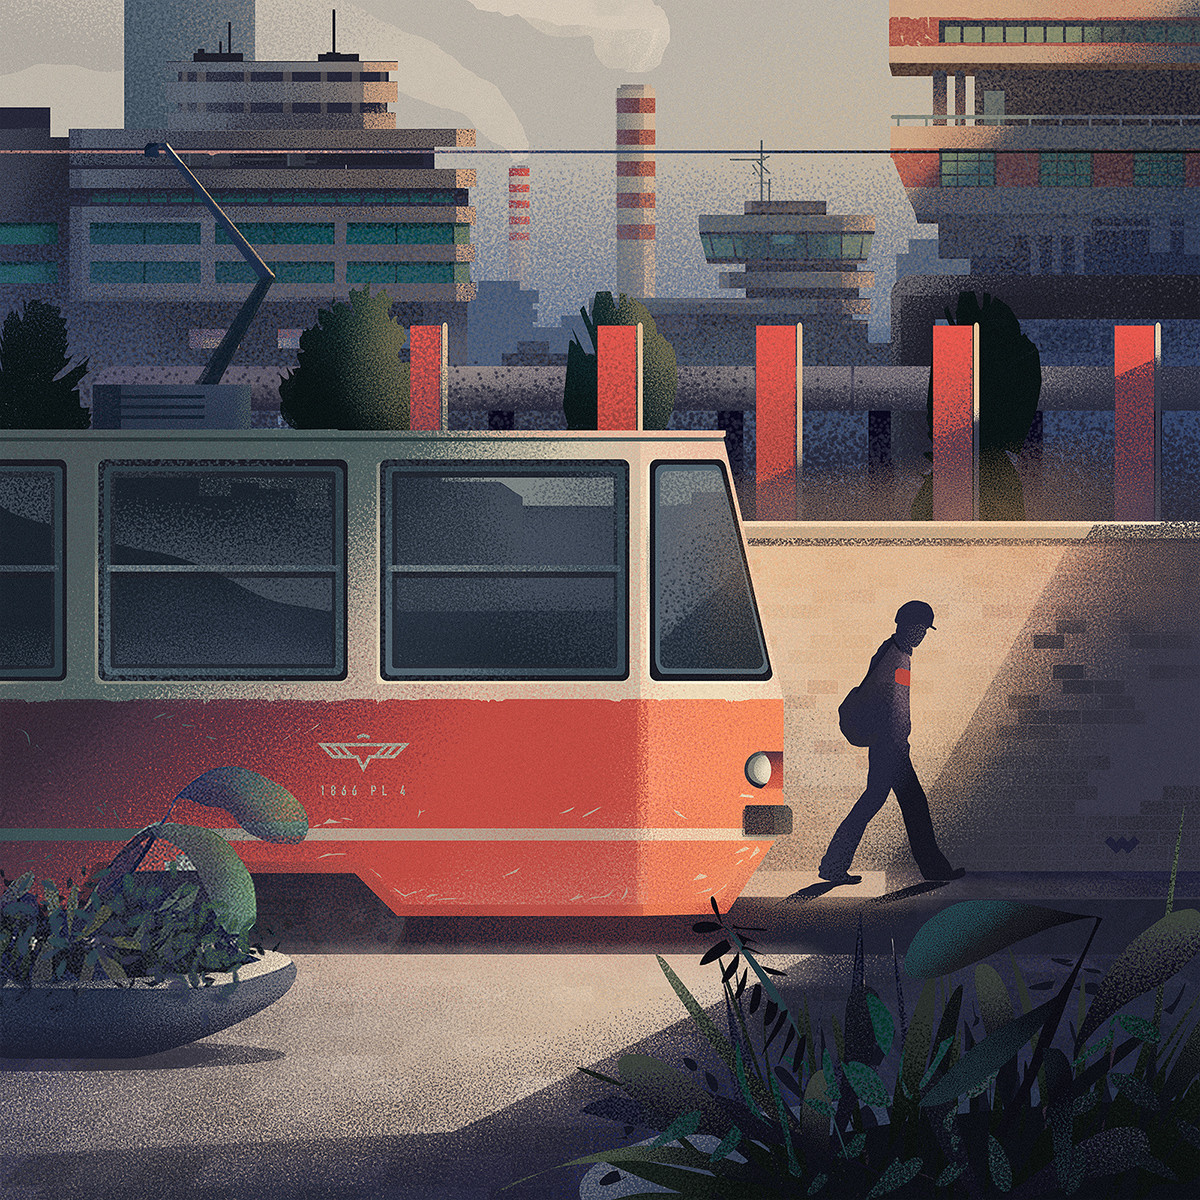 marcin-wolski-tram-1200px.jpg